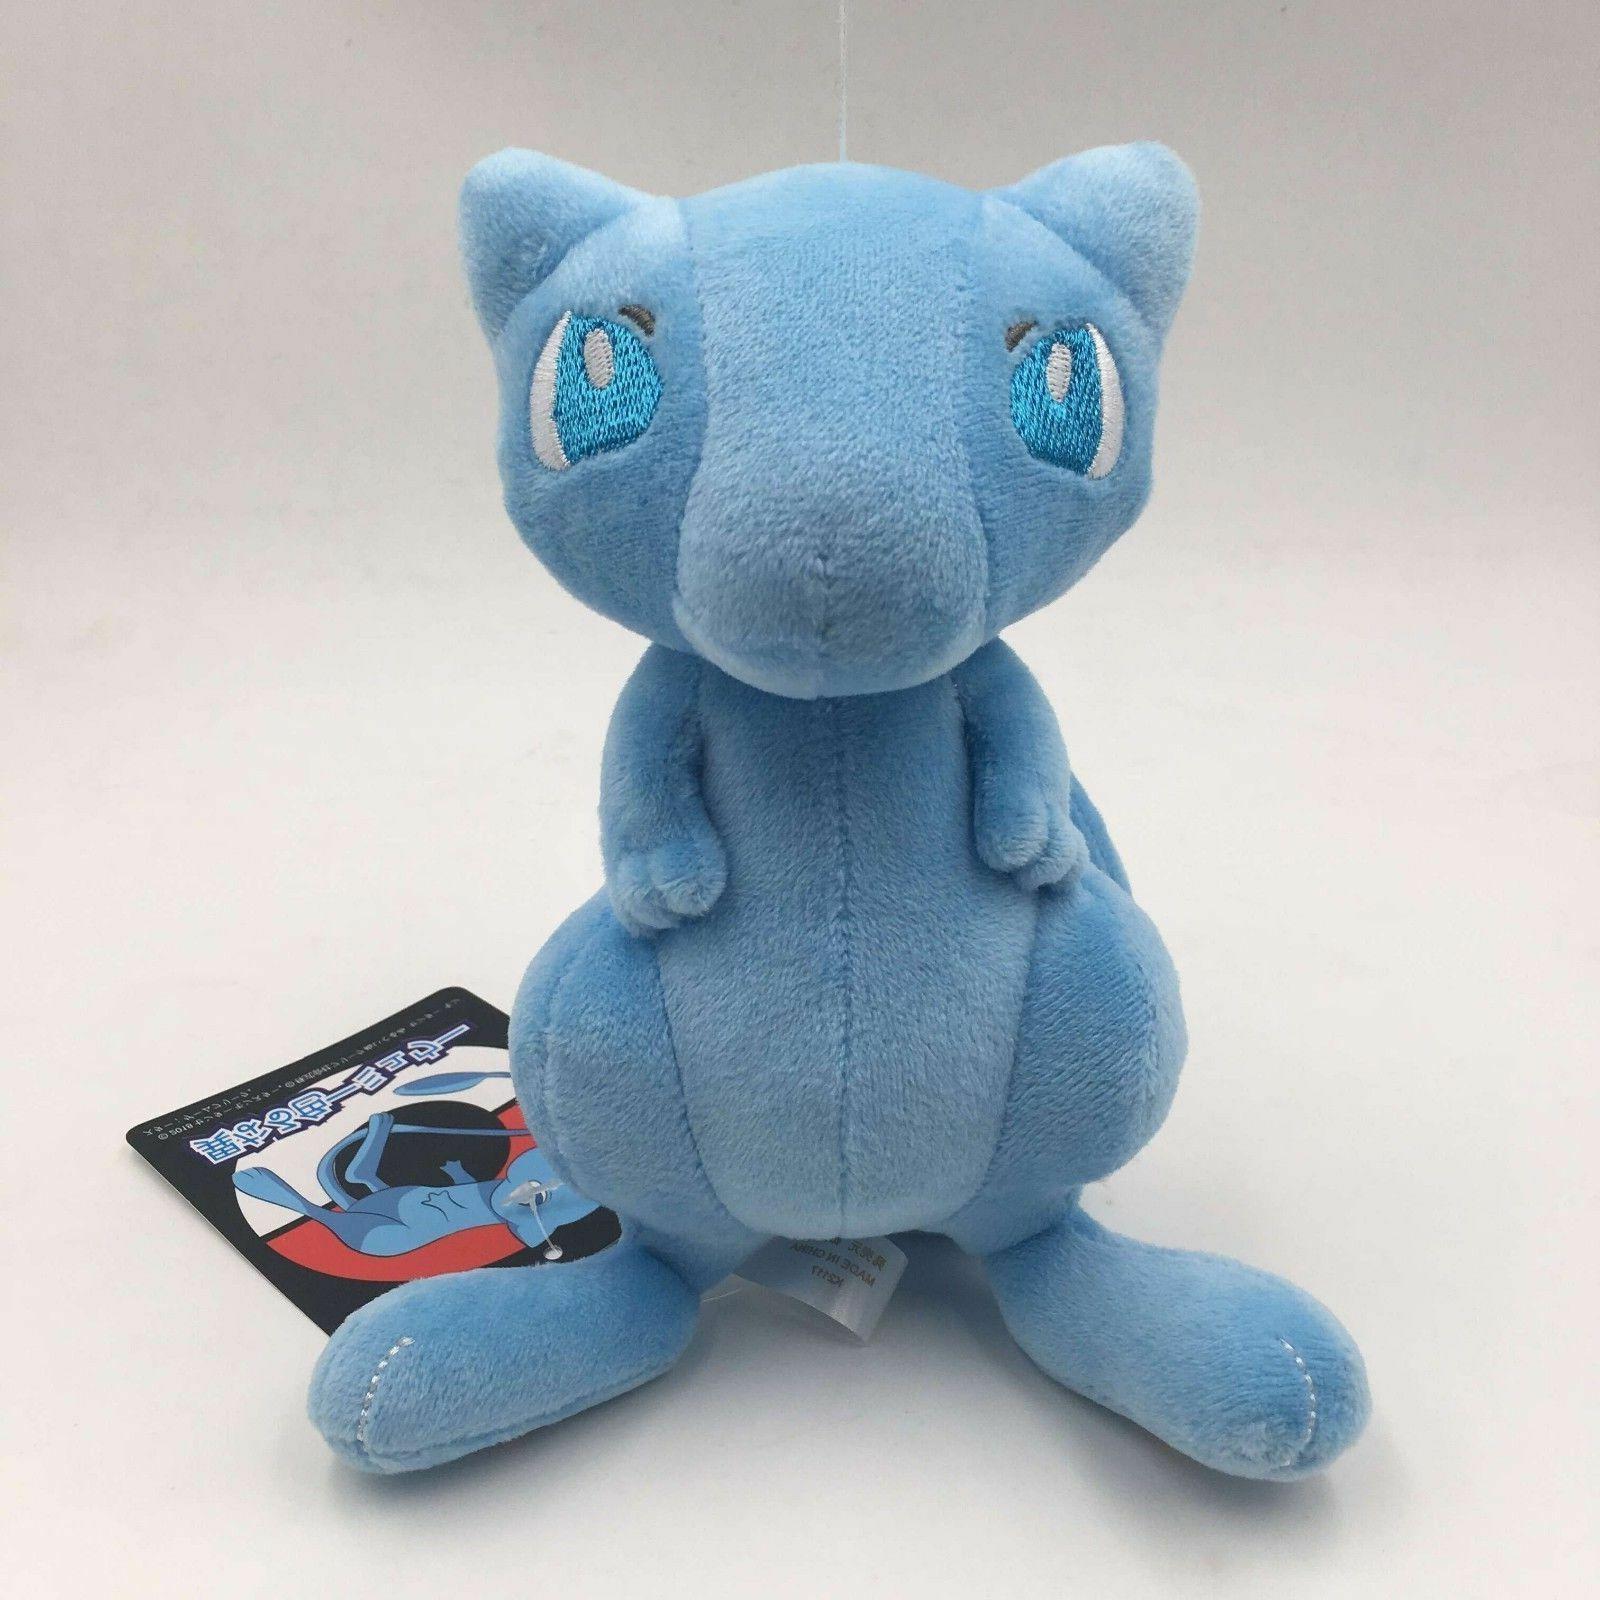 Pokemon Center Blue Mew Plush Doll Stuffed Animal Figure Toy